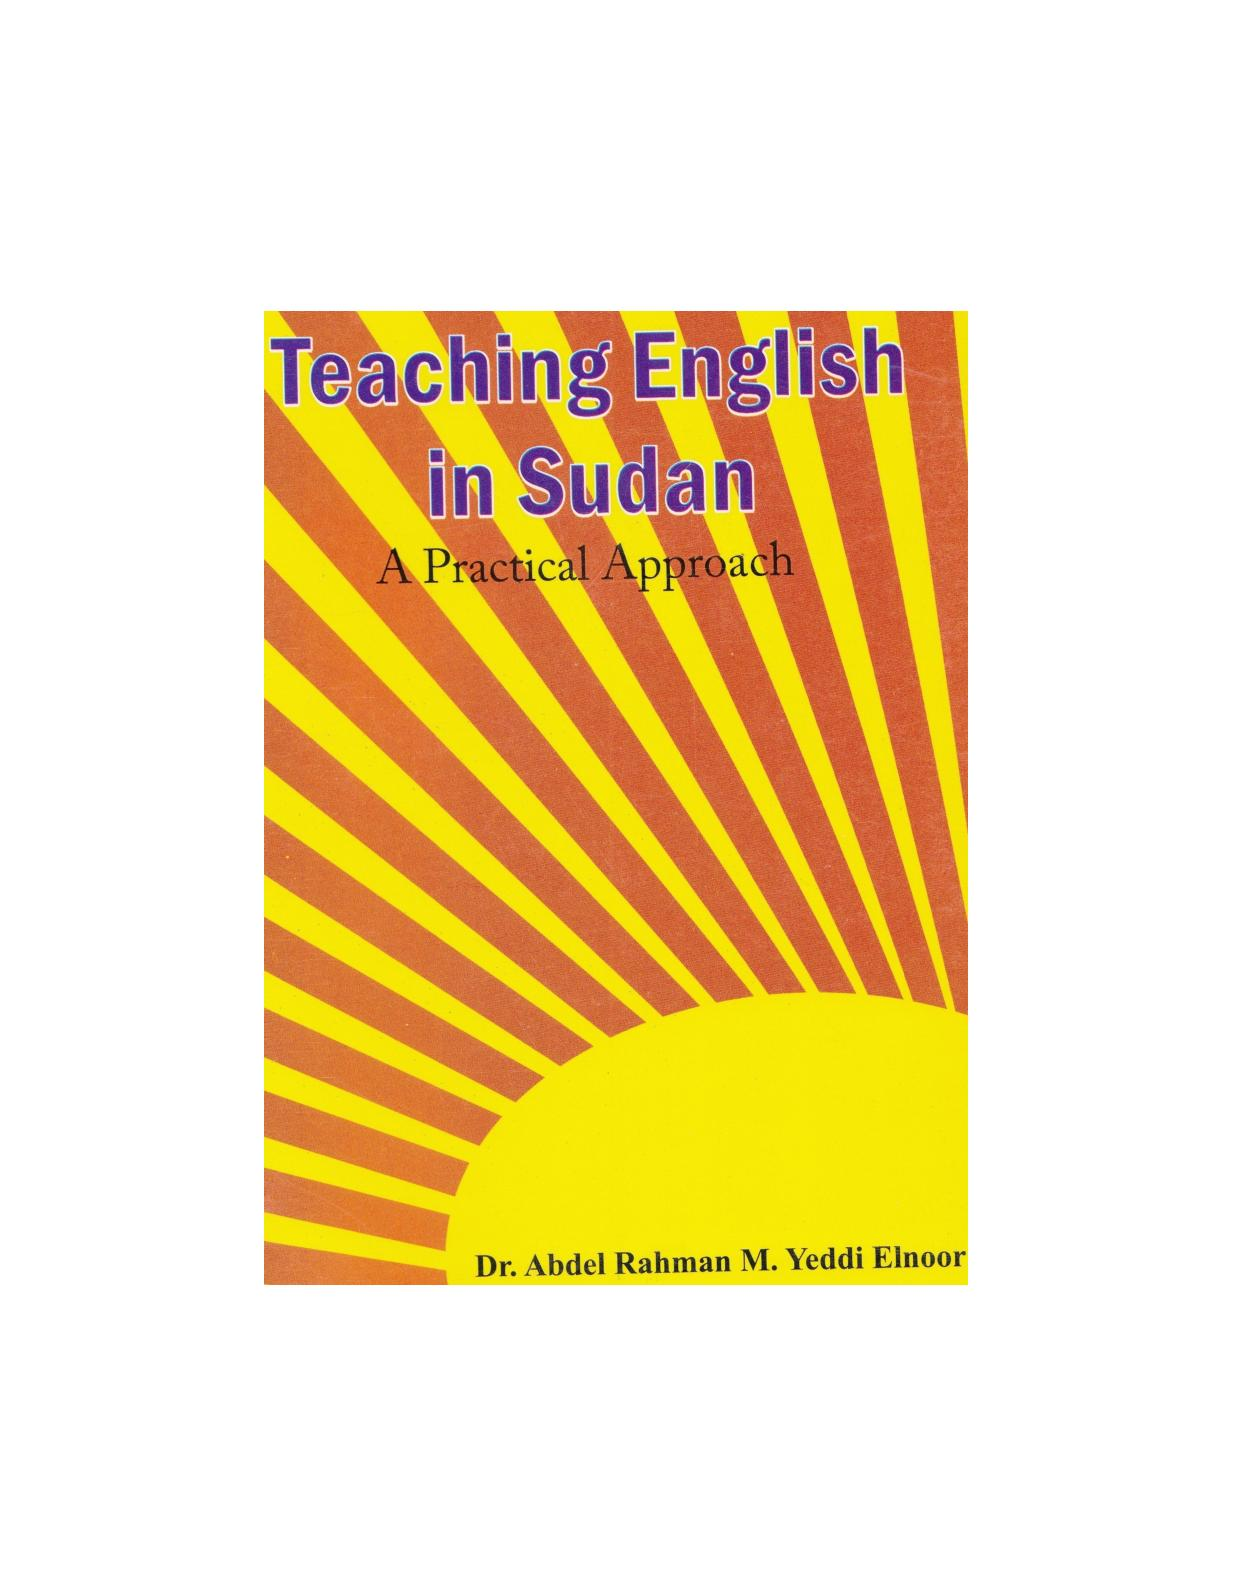 Teaching English In Sudan: A Practical Approach